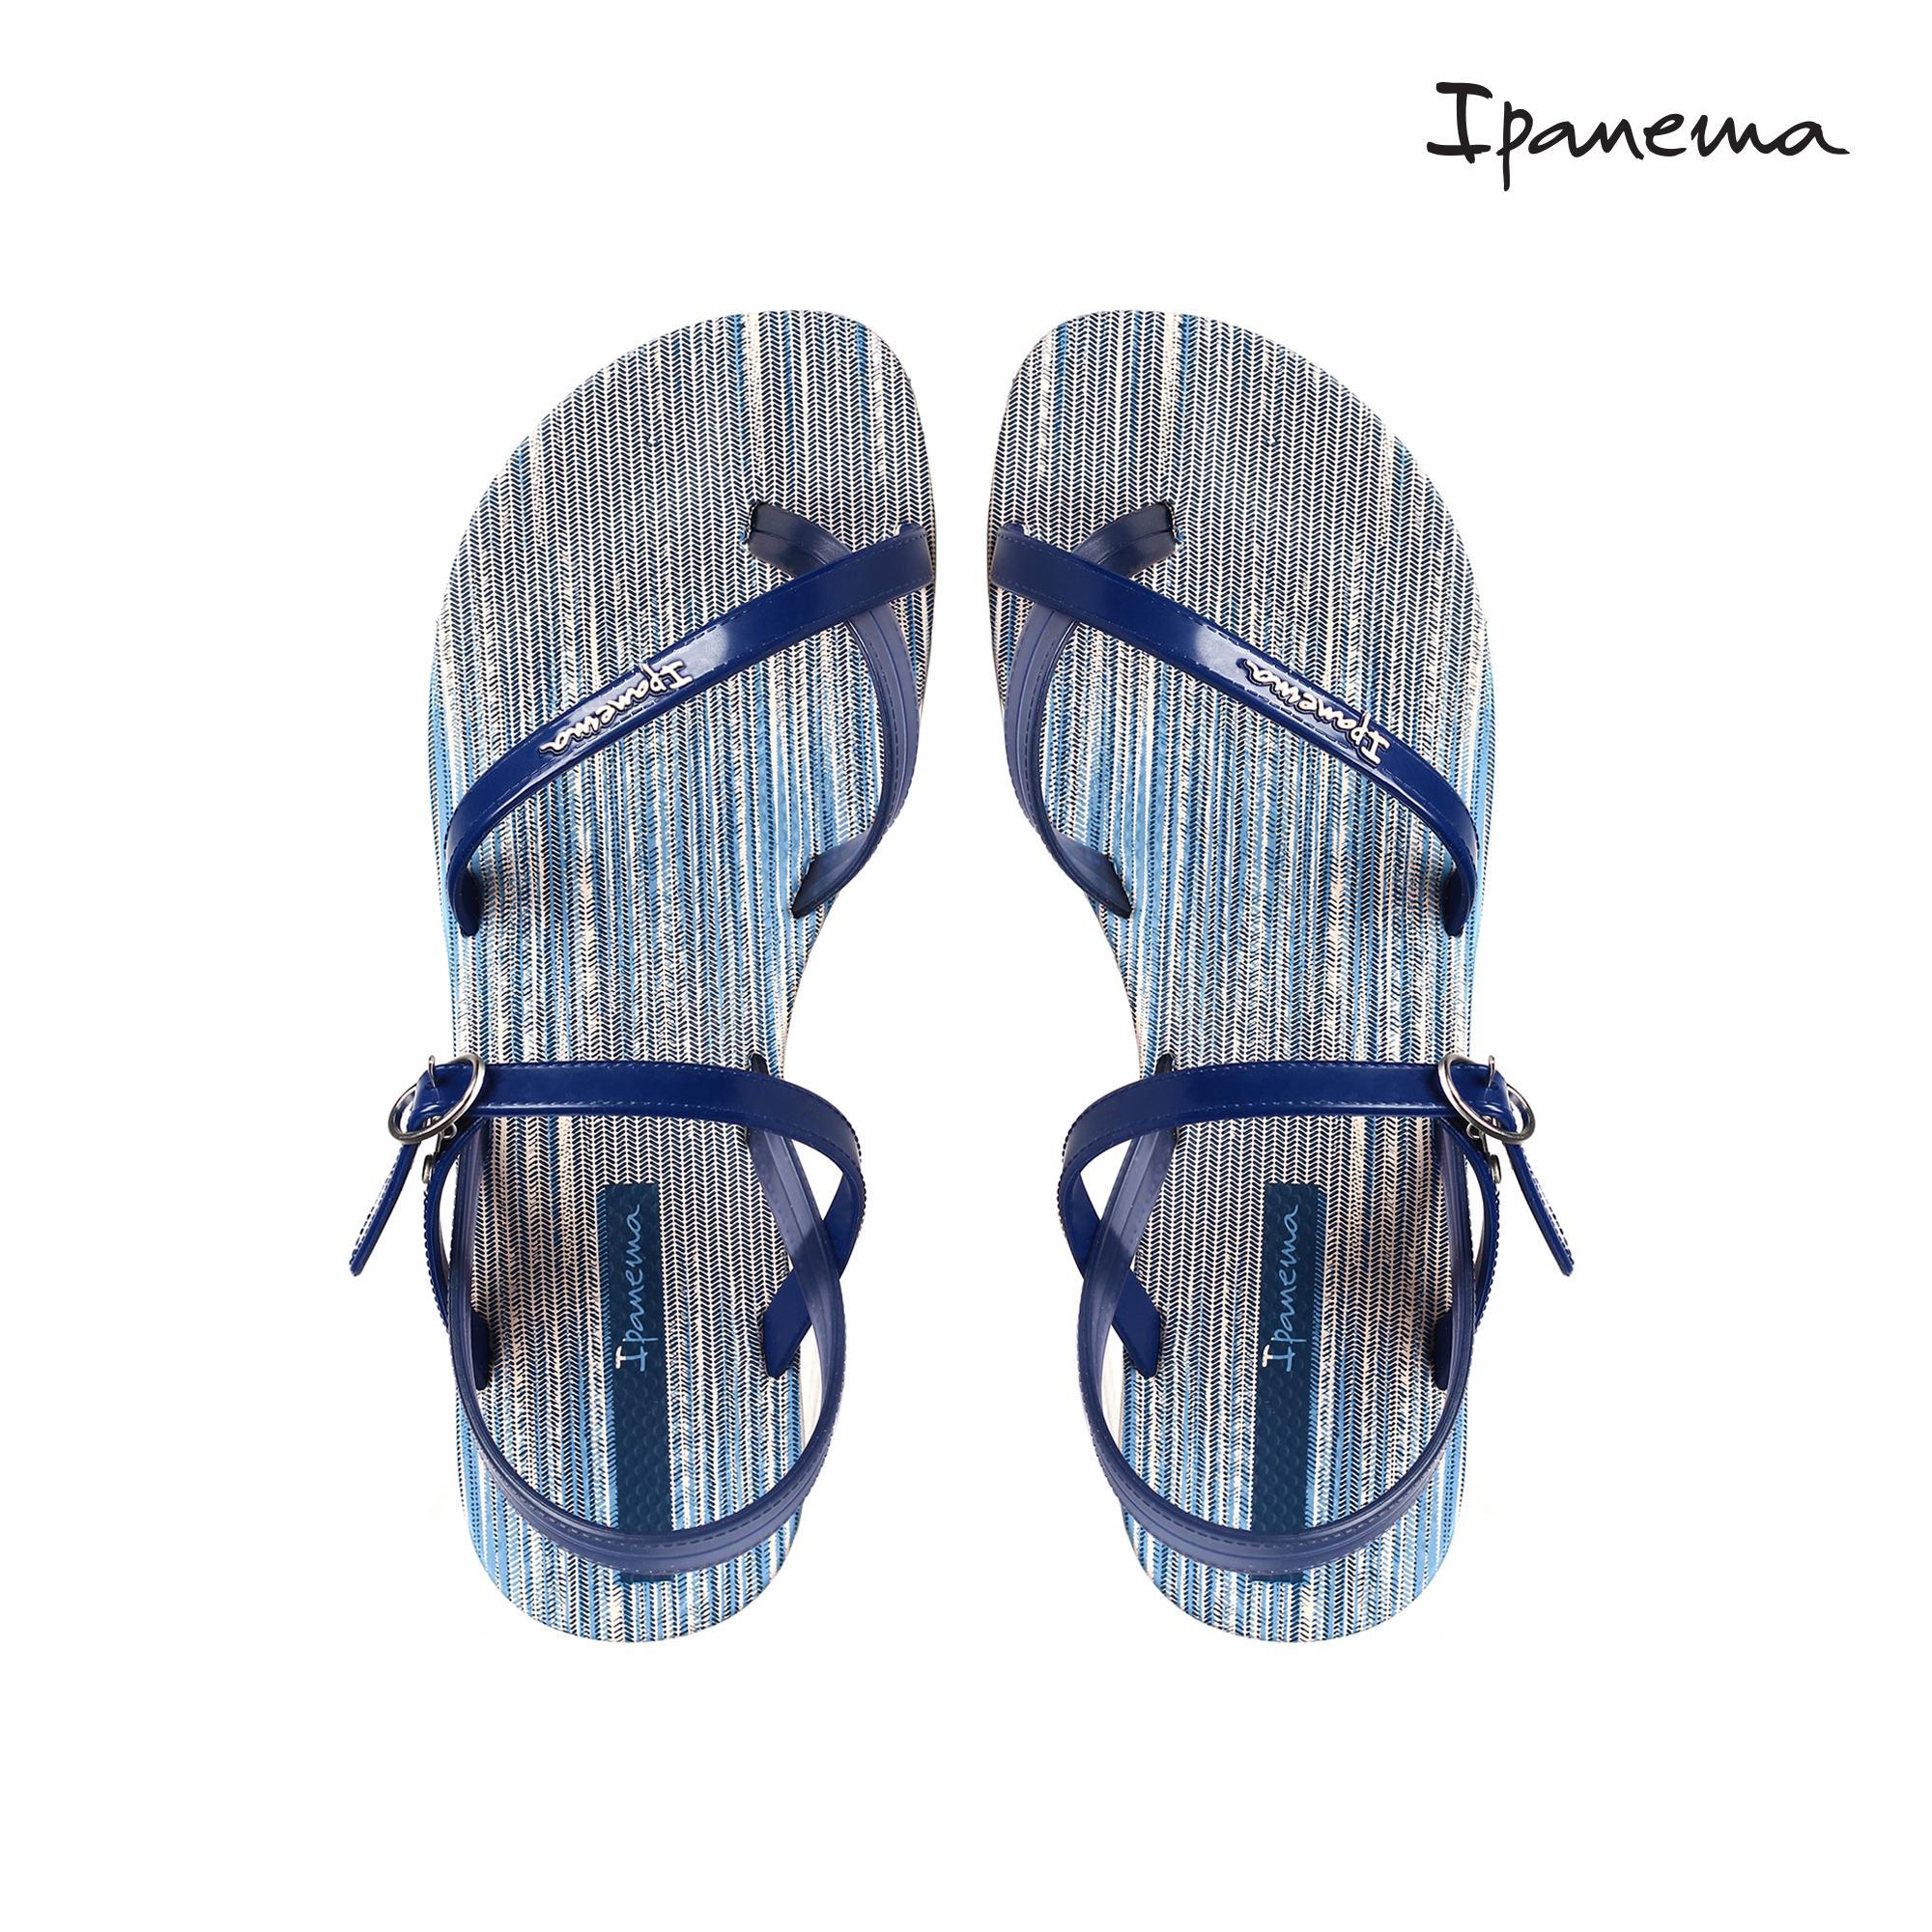 5134d17fdf30 Ipanema Philippines  Ipanema price list - Ipanema Flip Flop ...